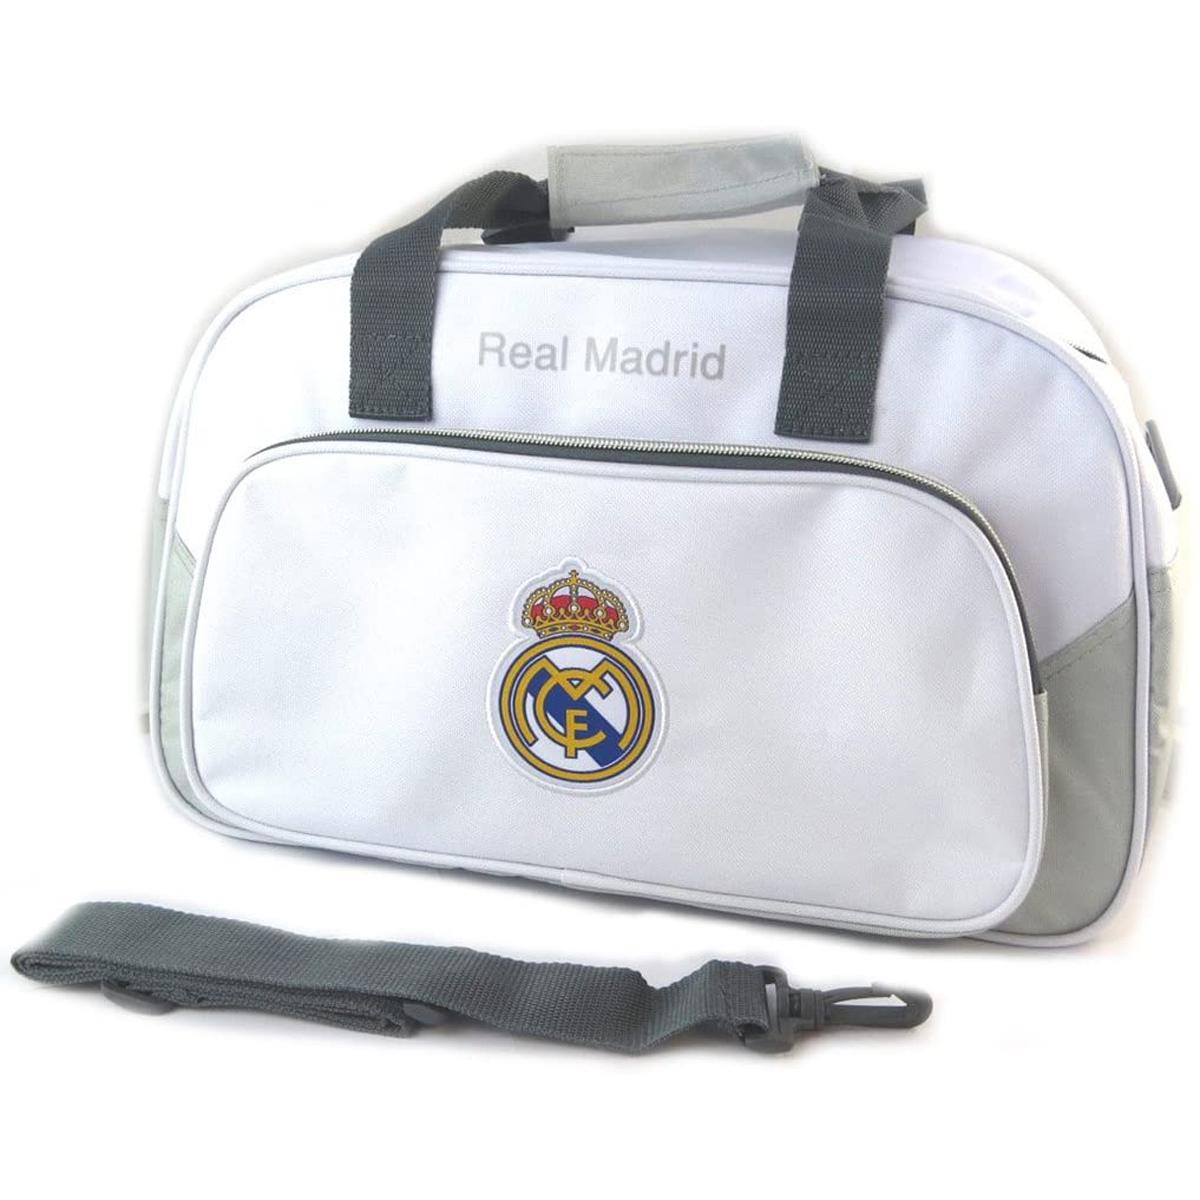 Sac de sport \'Real Madrid\' blanc gris - 40x24x20 cm - [N7468]